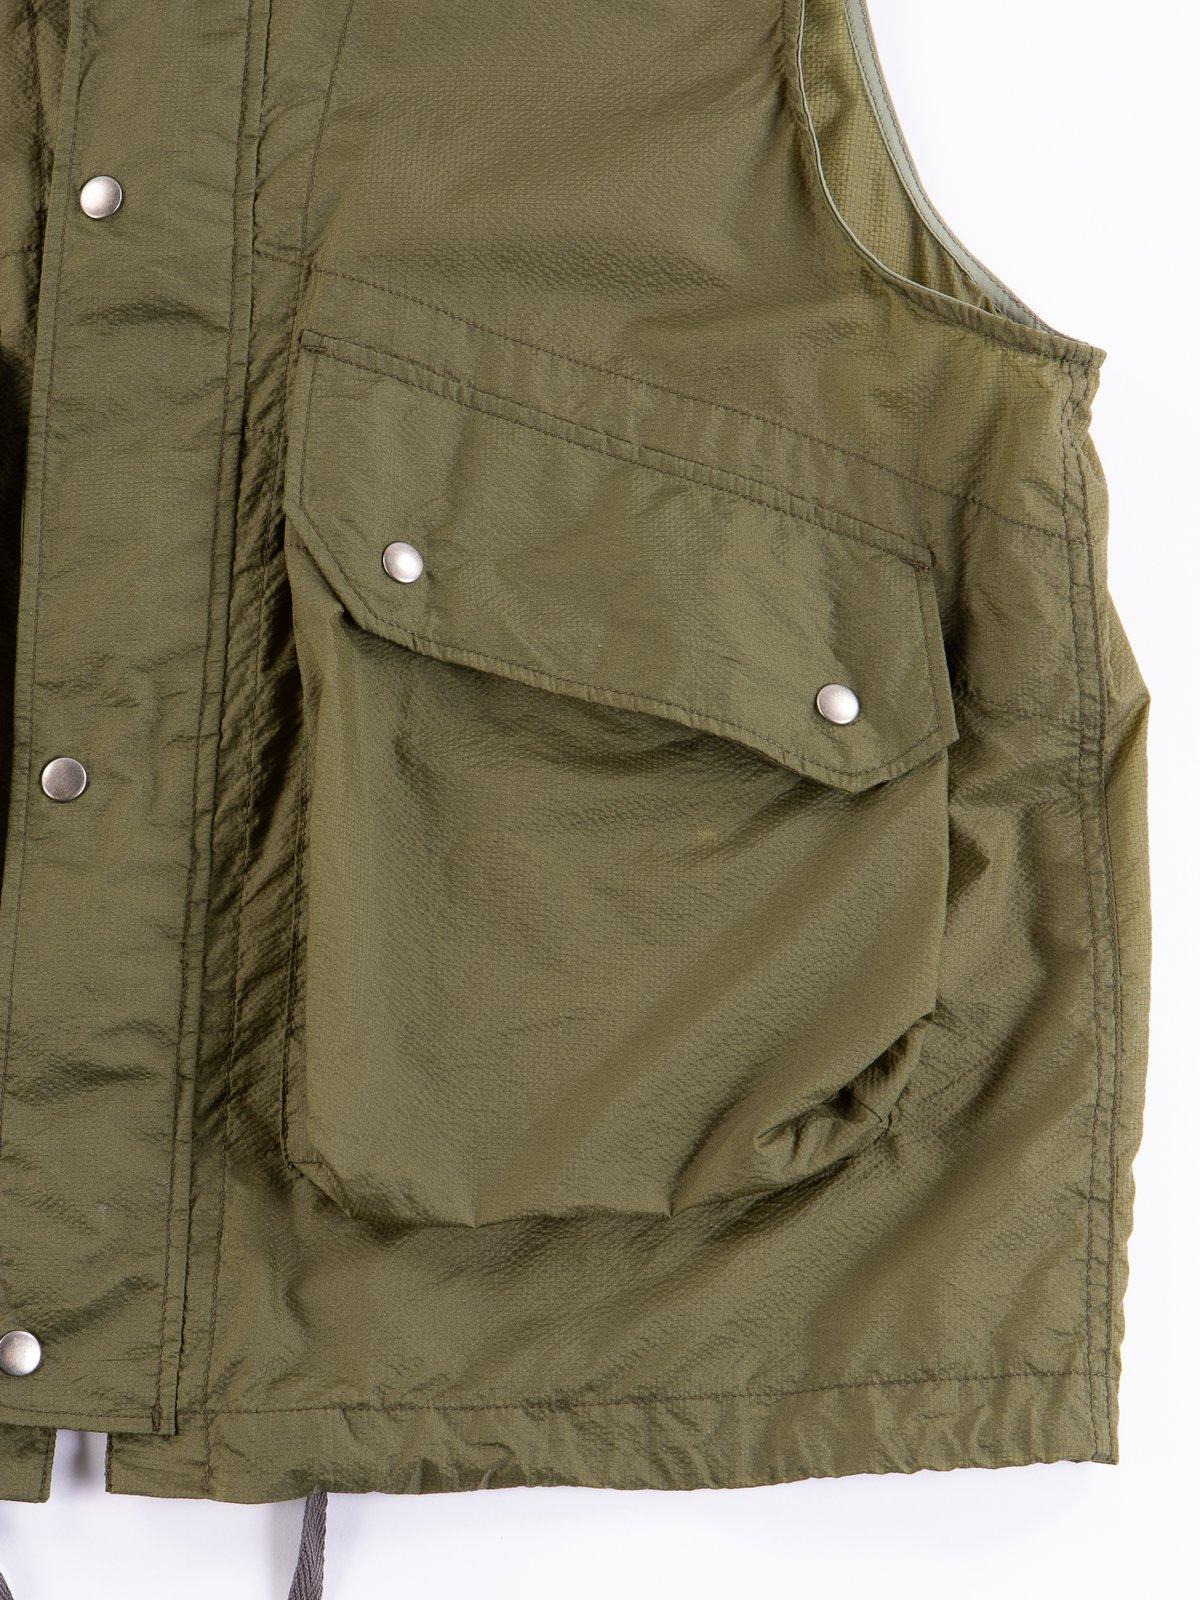 Olive Nylon Micro Ripstop Field Vest - Image 4